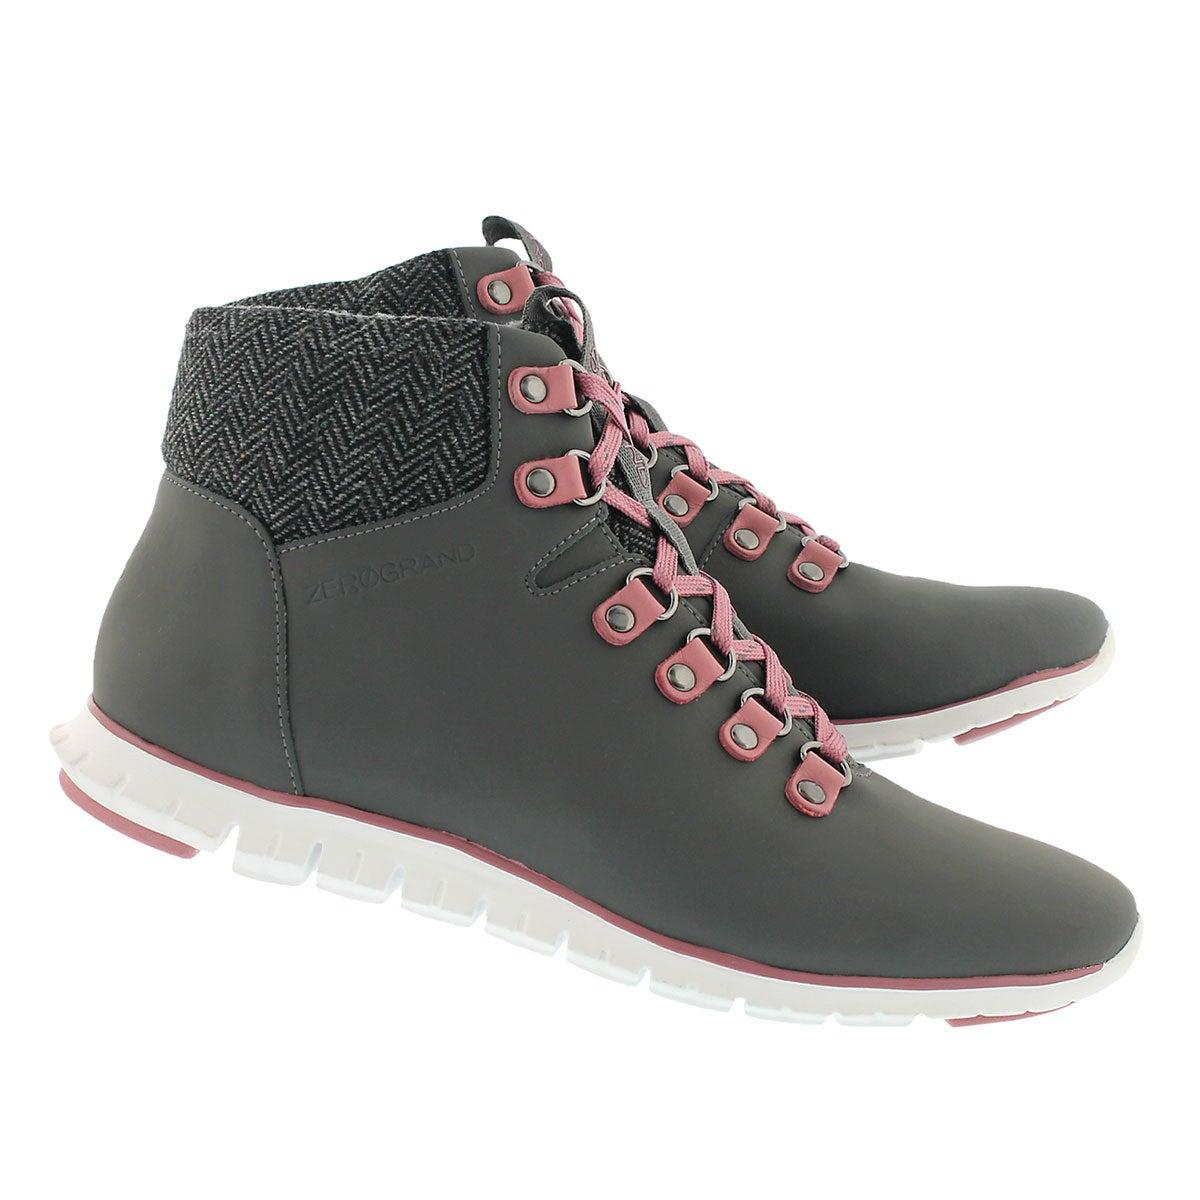 Lds Zerogrand castlerock wpf hiking boot